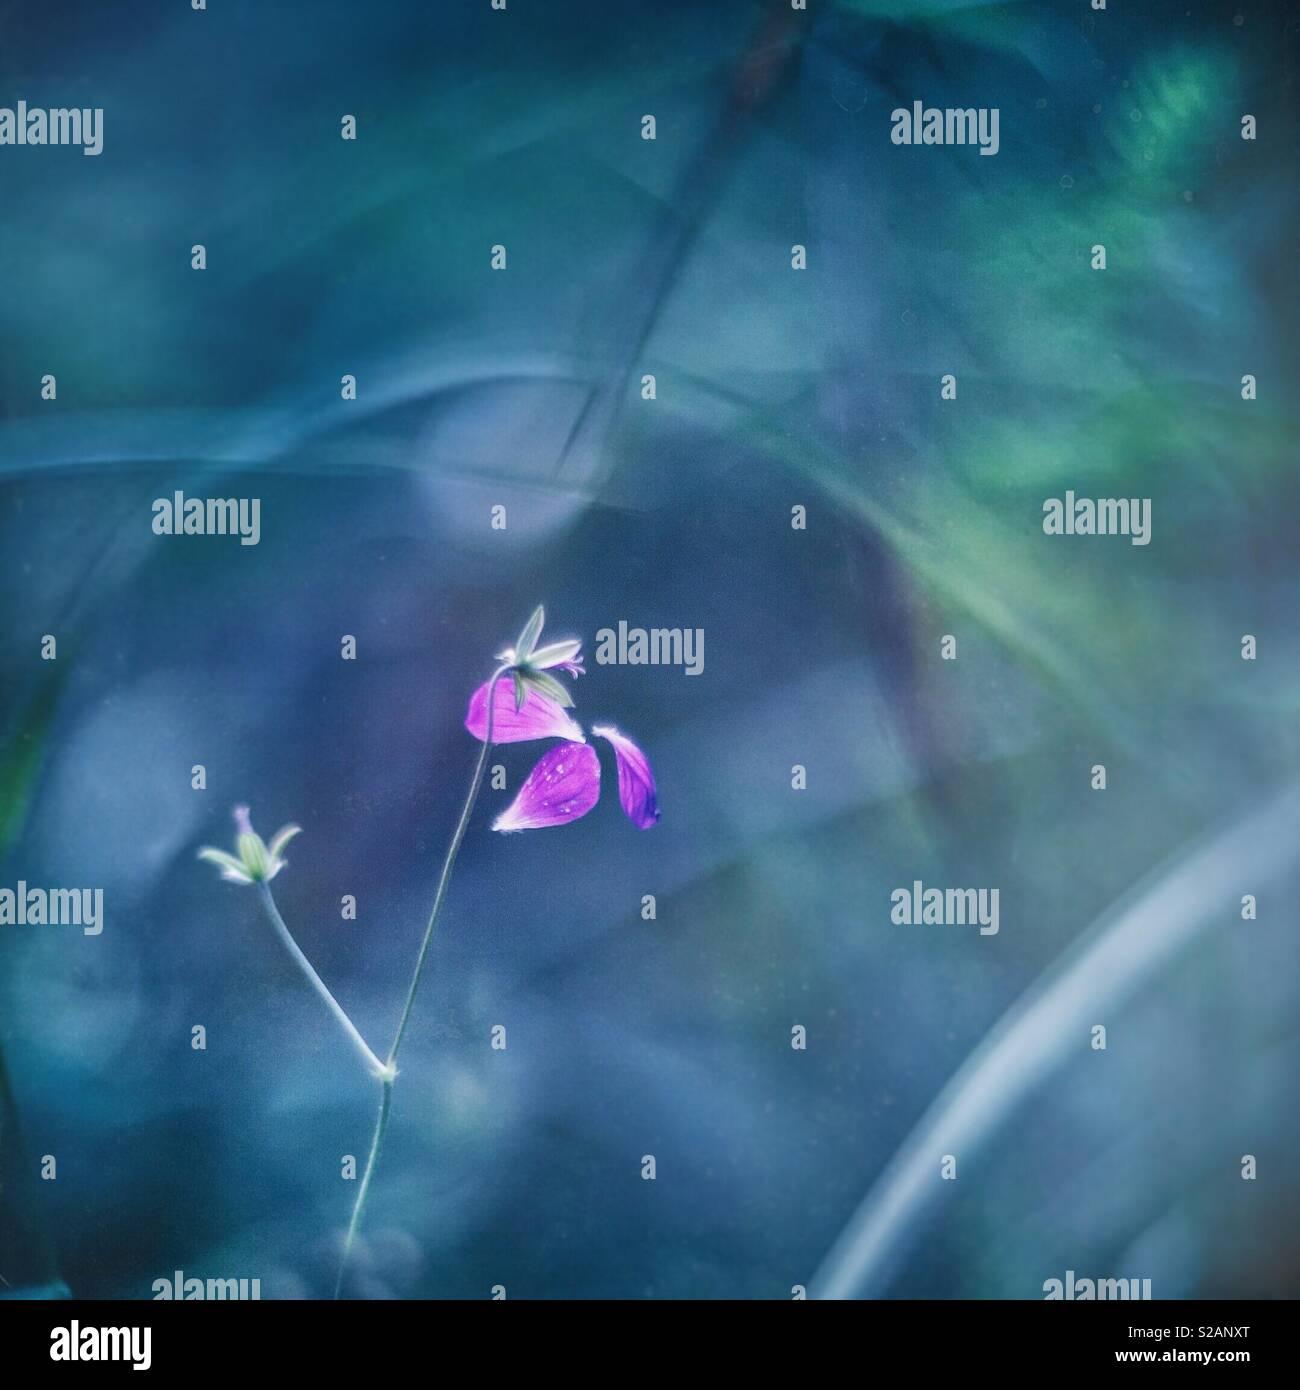 Falling petals - Stock Image